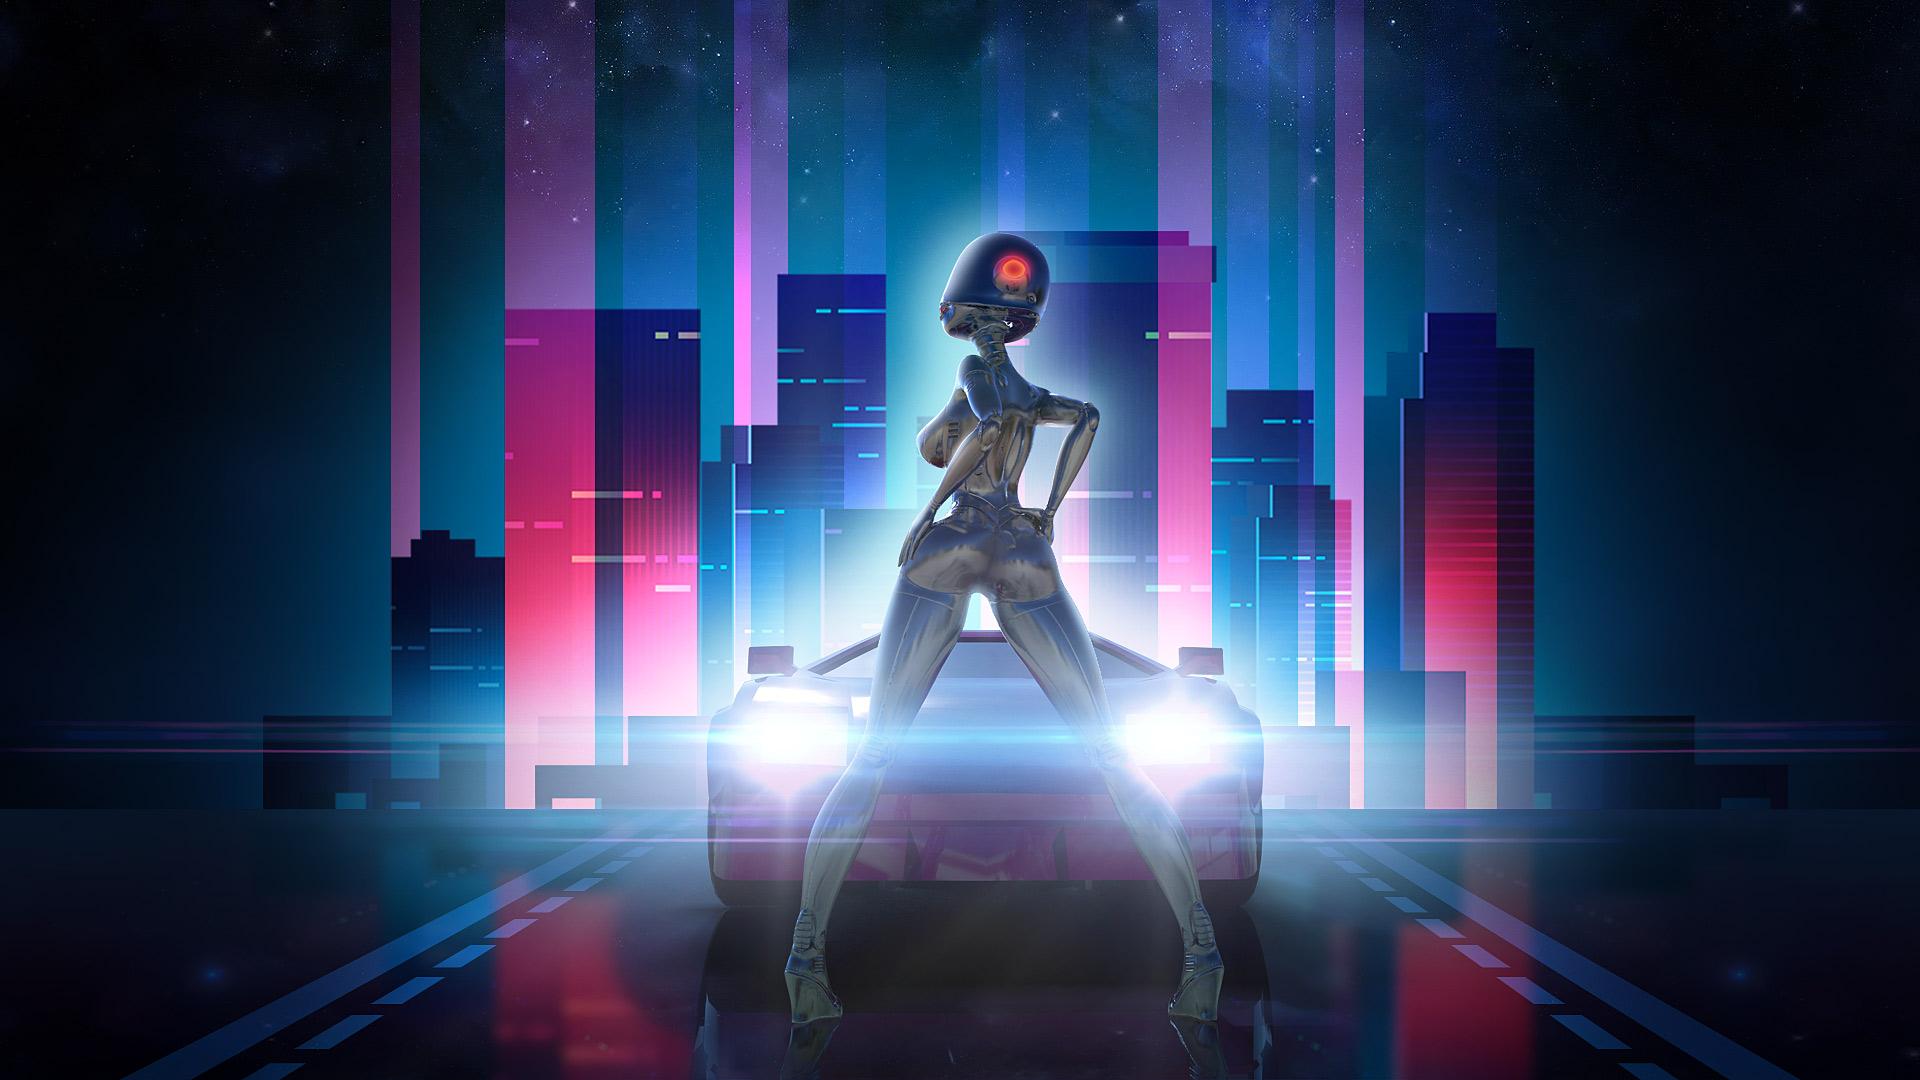 Hotline Miami Car Wallpaper Neon Wallpapers Hd Pixelstalk Net